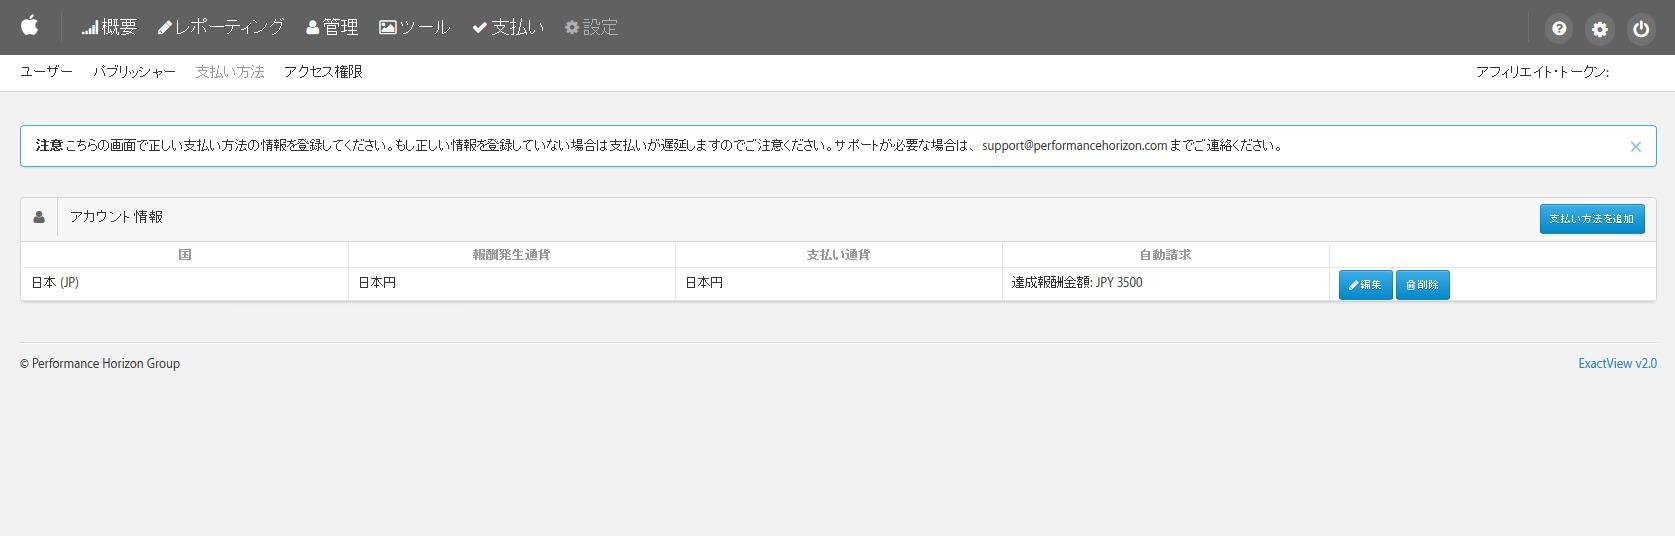 iTunesアフィリエイトの支払い方法設定画面(設定済み)のスクリーンショットです。